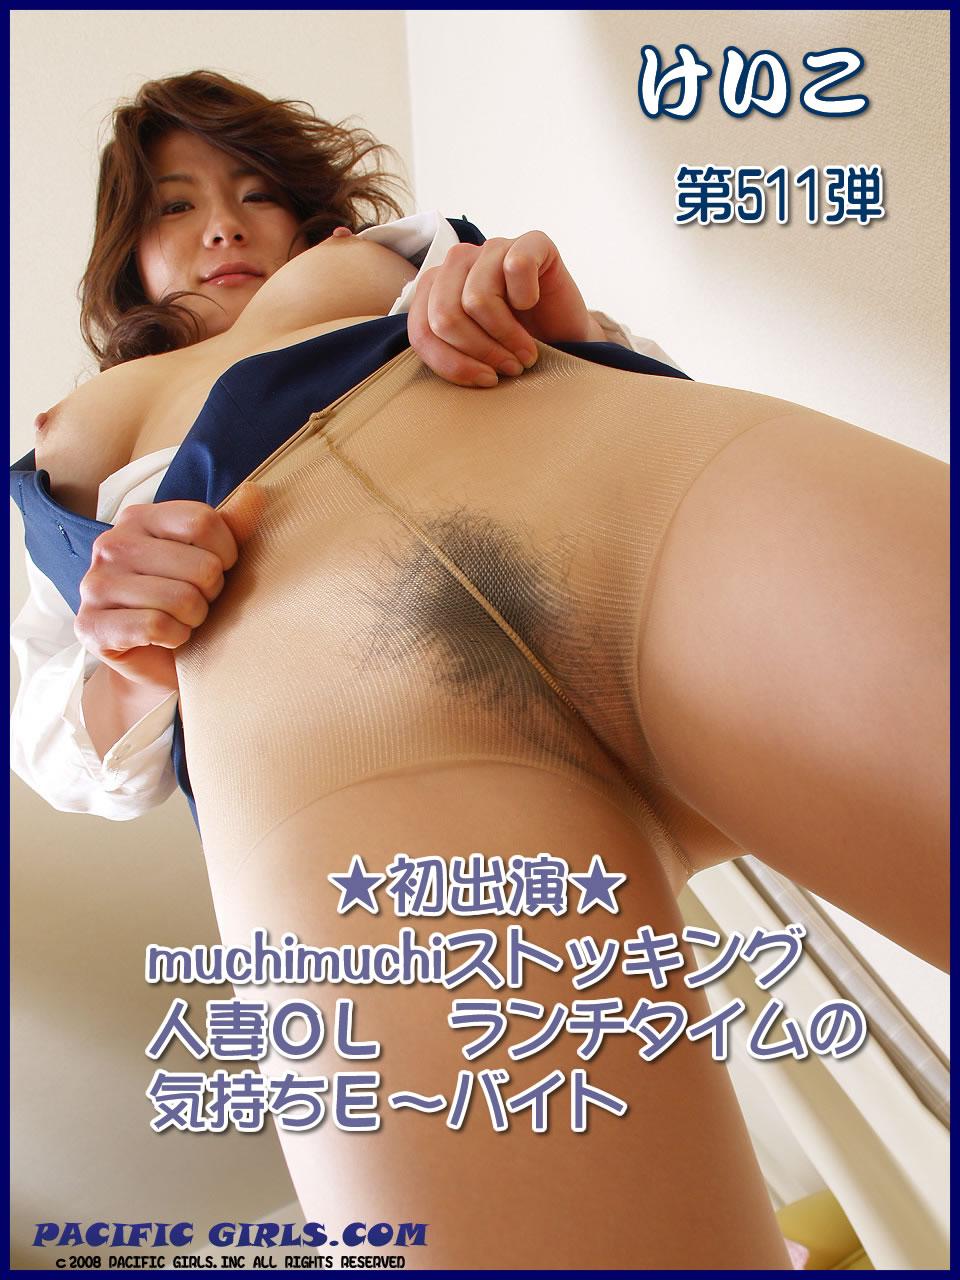 pacificgirls 516 太平洋娘 第516弾 あや Pacific Girls No 516 Aya | Download ...